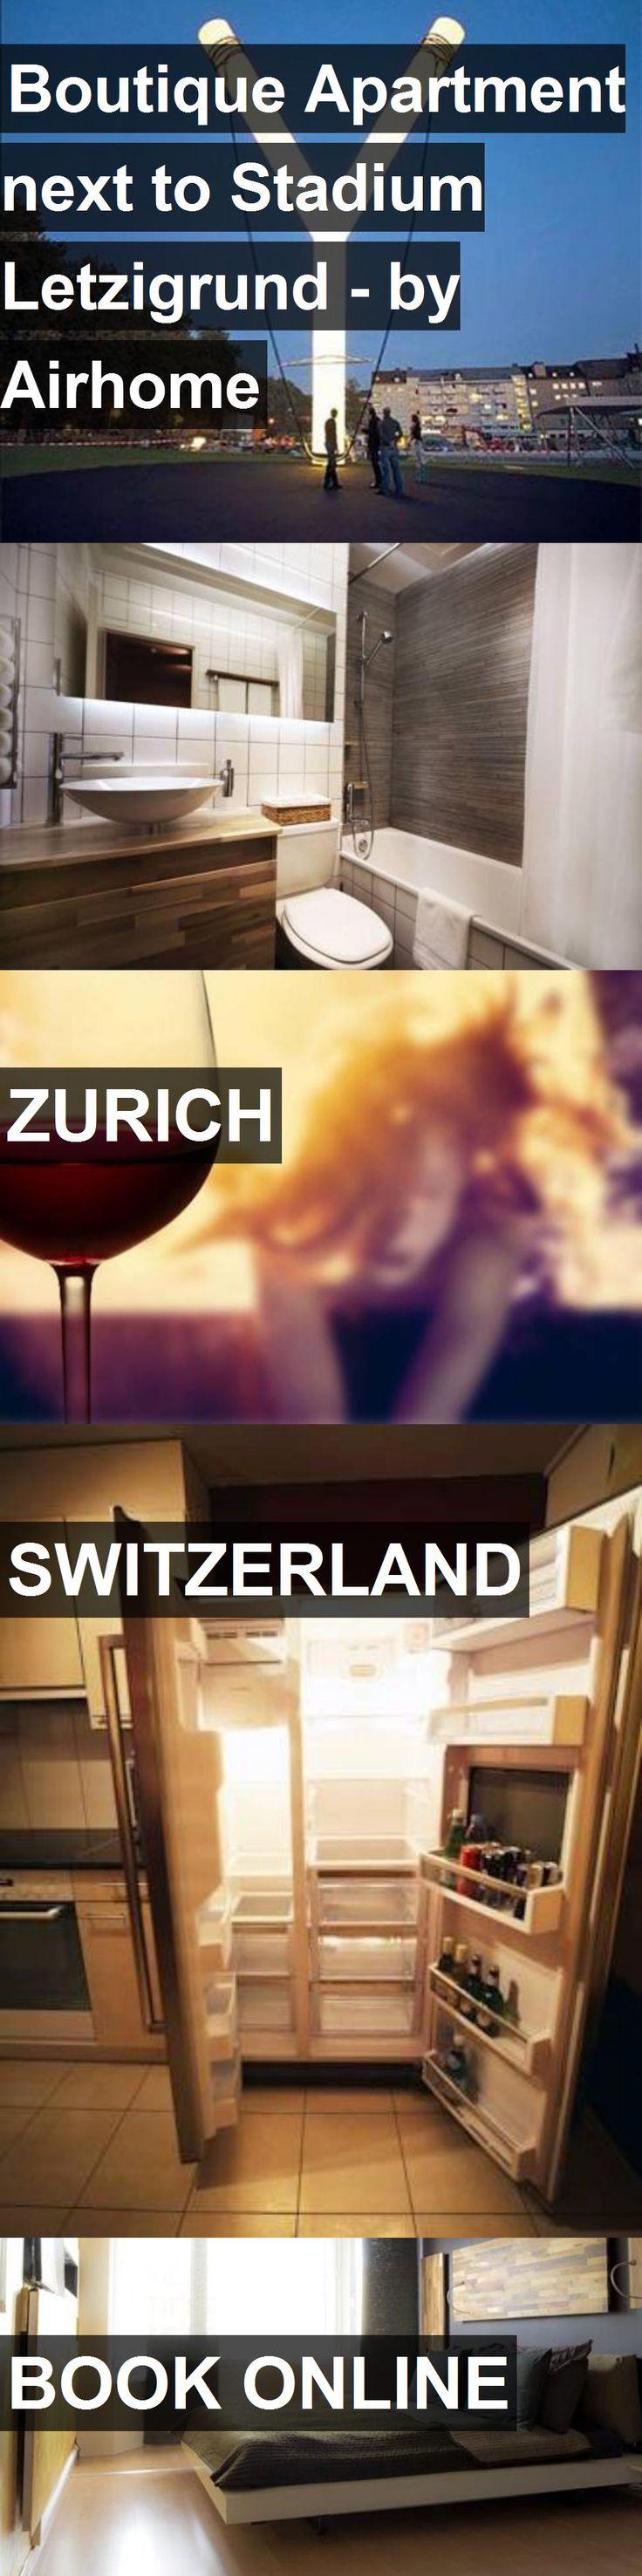 Boutique Apartment next to Stadium Letzigrund - by Airhome in Zurich, Switzerland. For more information, photos, reviews and best prices please follow the link. #Switzerland #Zurich #travel #vacation #apartment